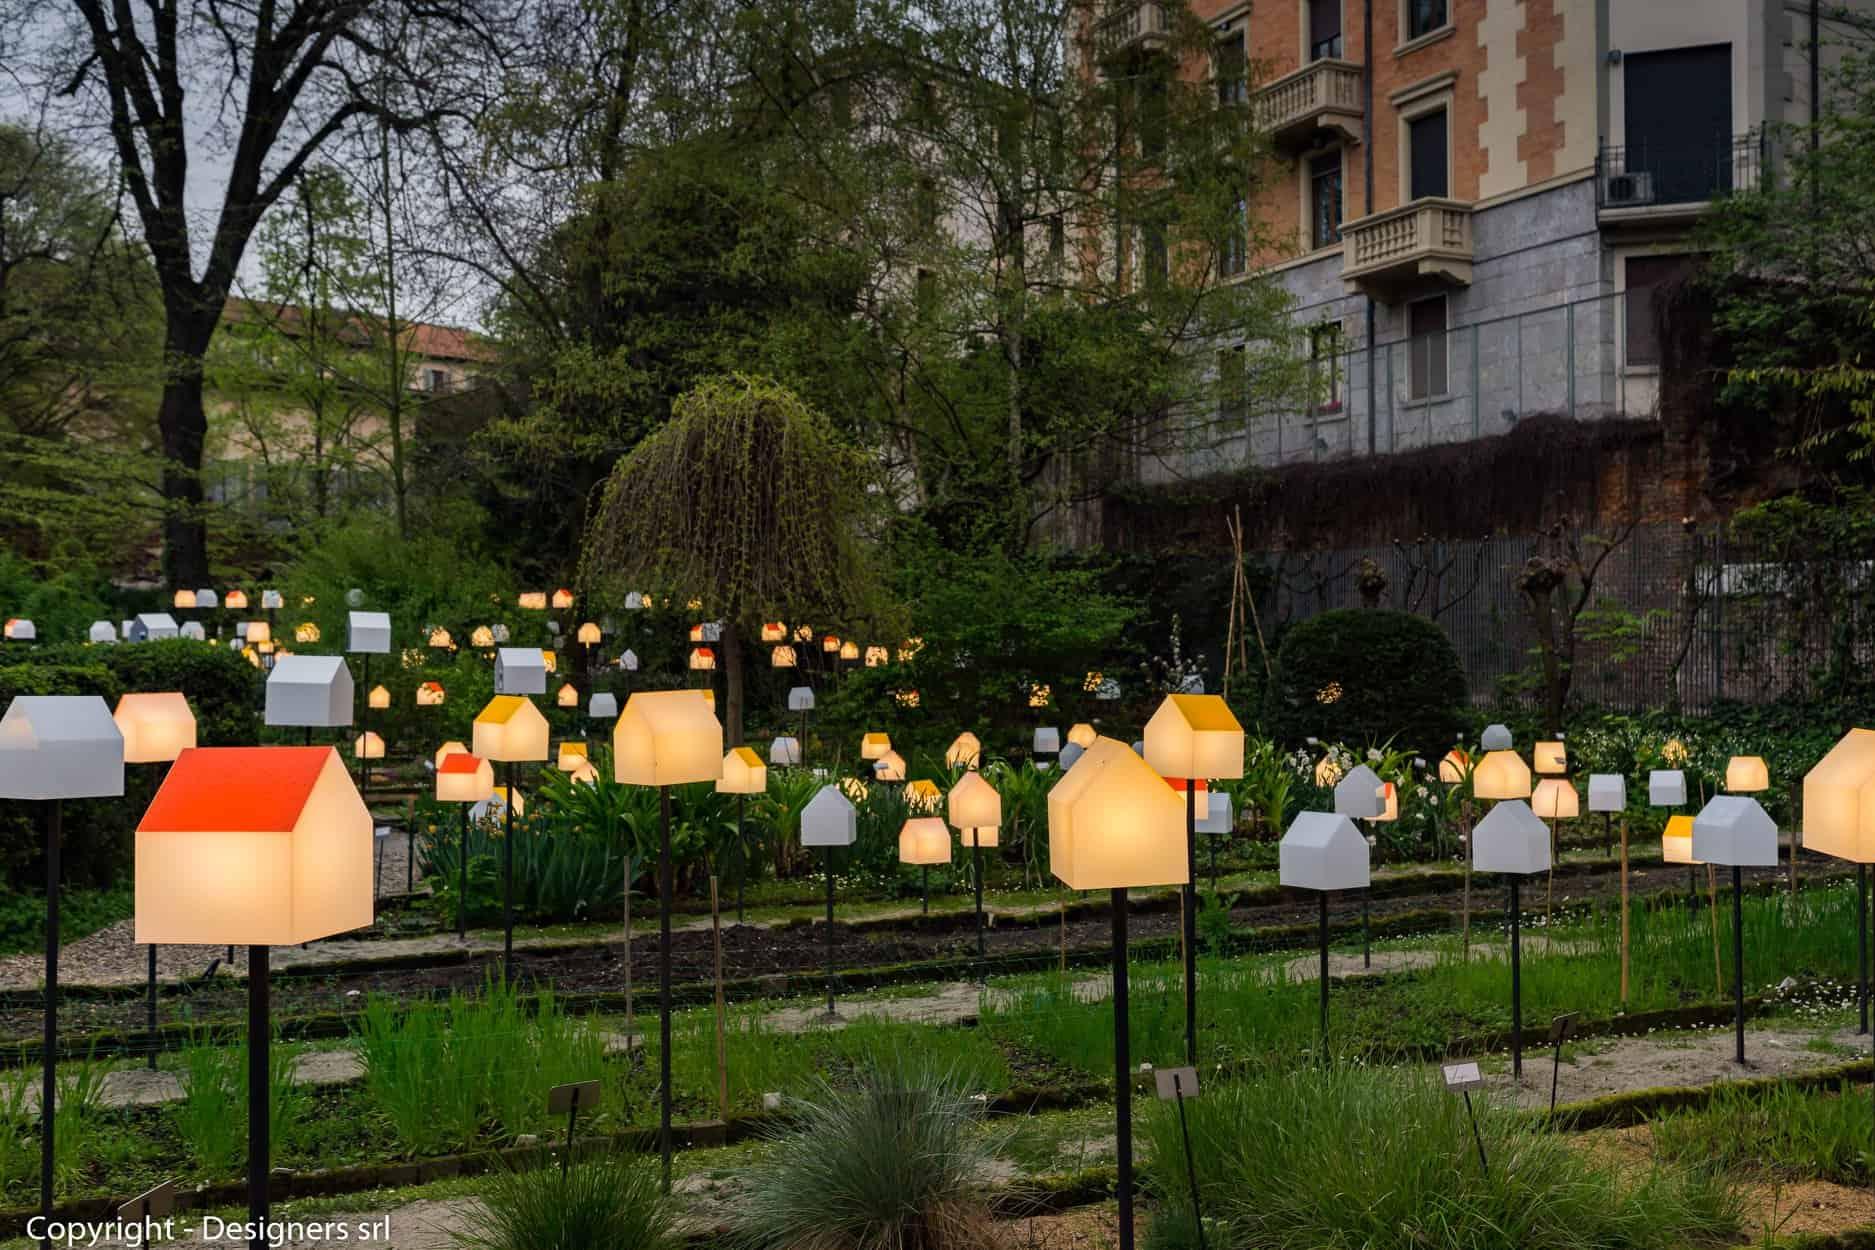 Giardino botanico milano luoghi romantici a milano u betvipwin club